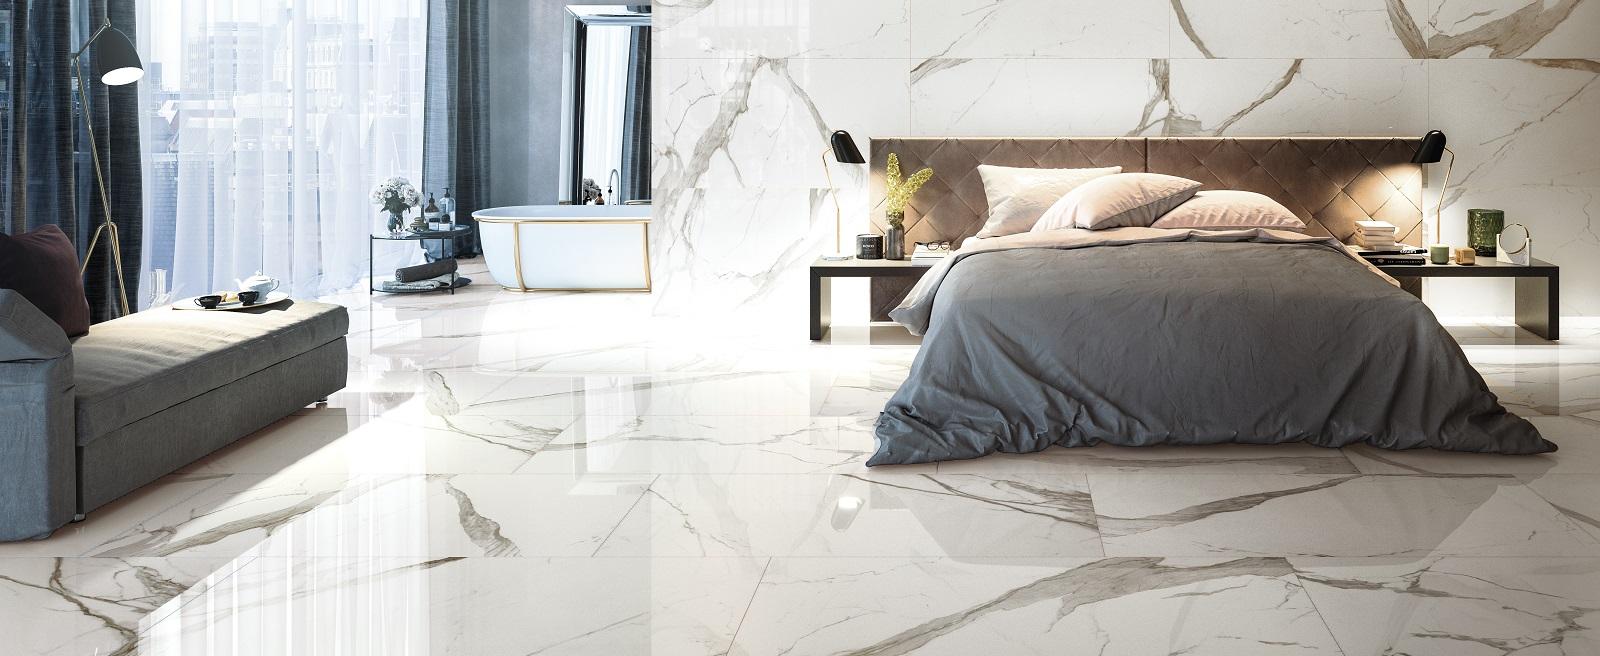 Carrelage Imitation Parquet 30X60 carrelage imitation marbre - prestigio